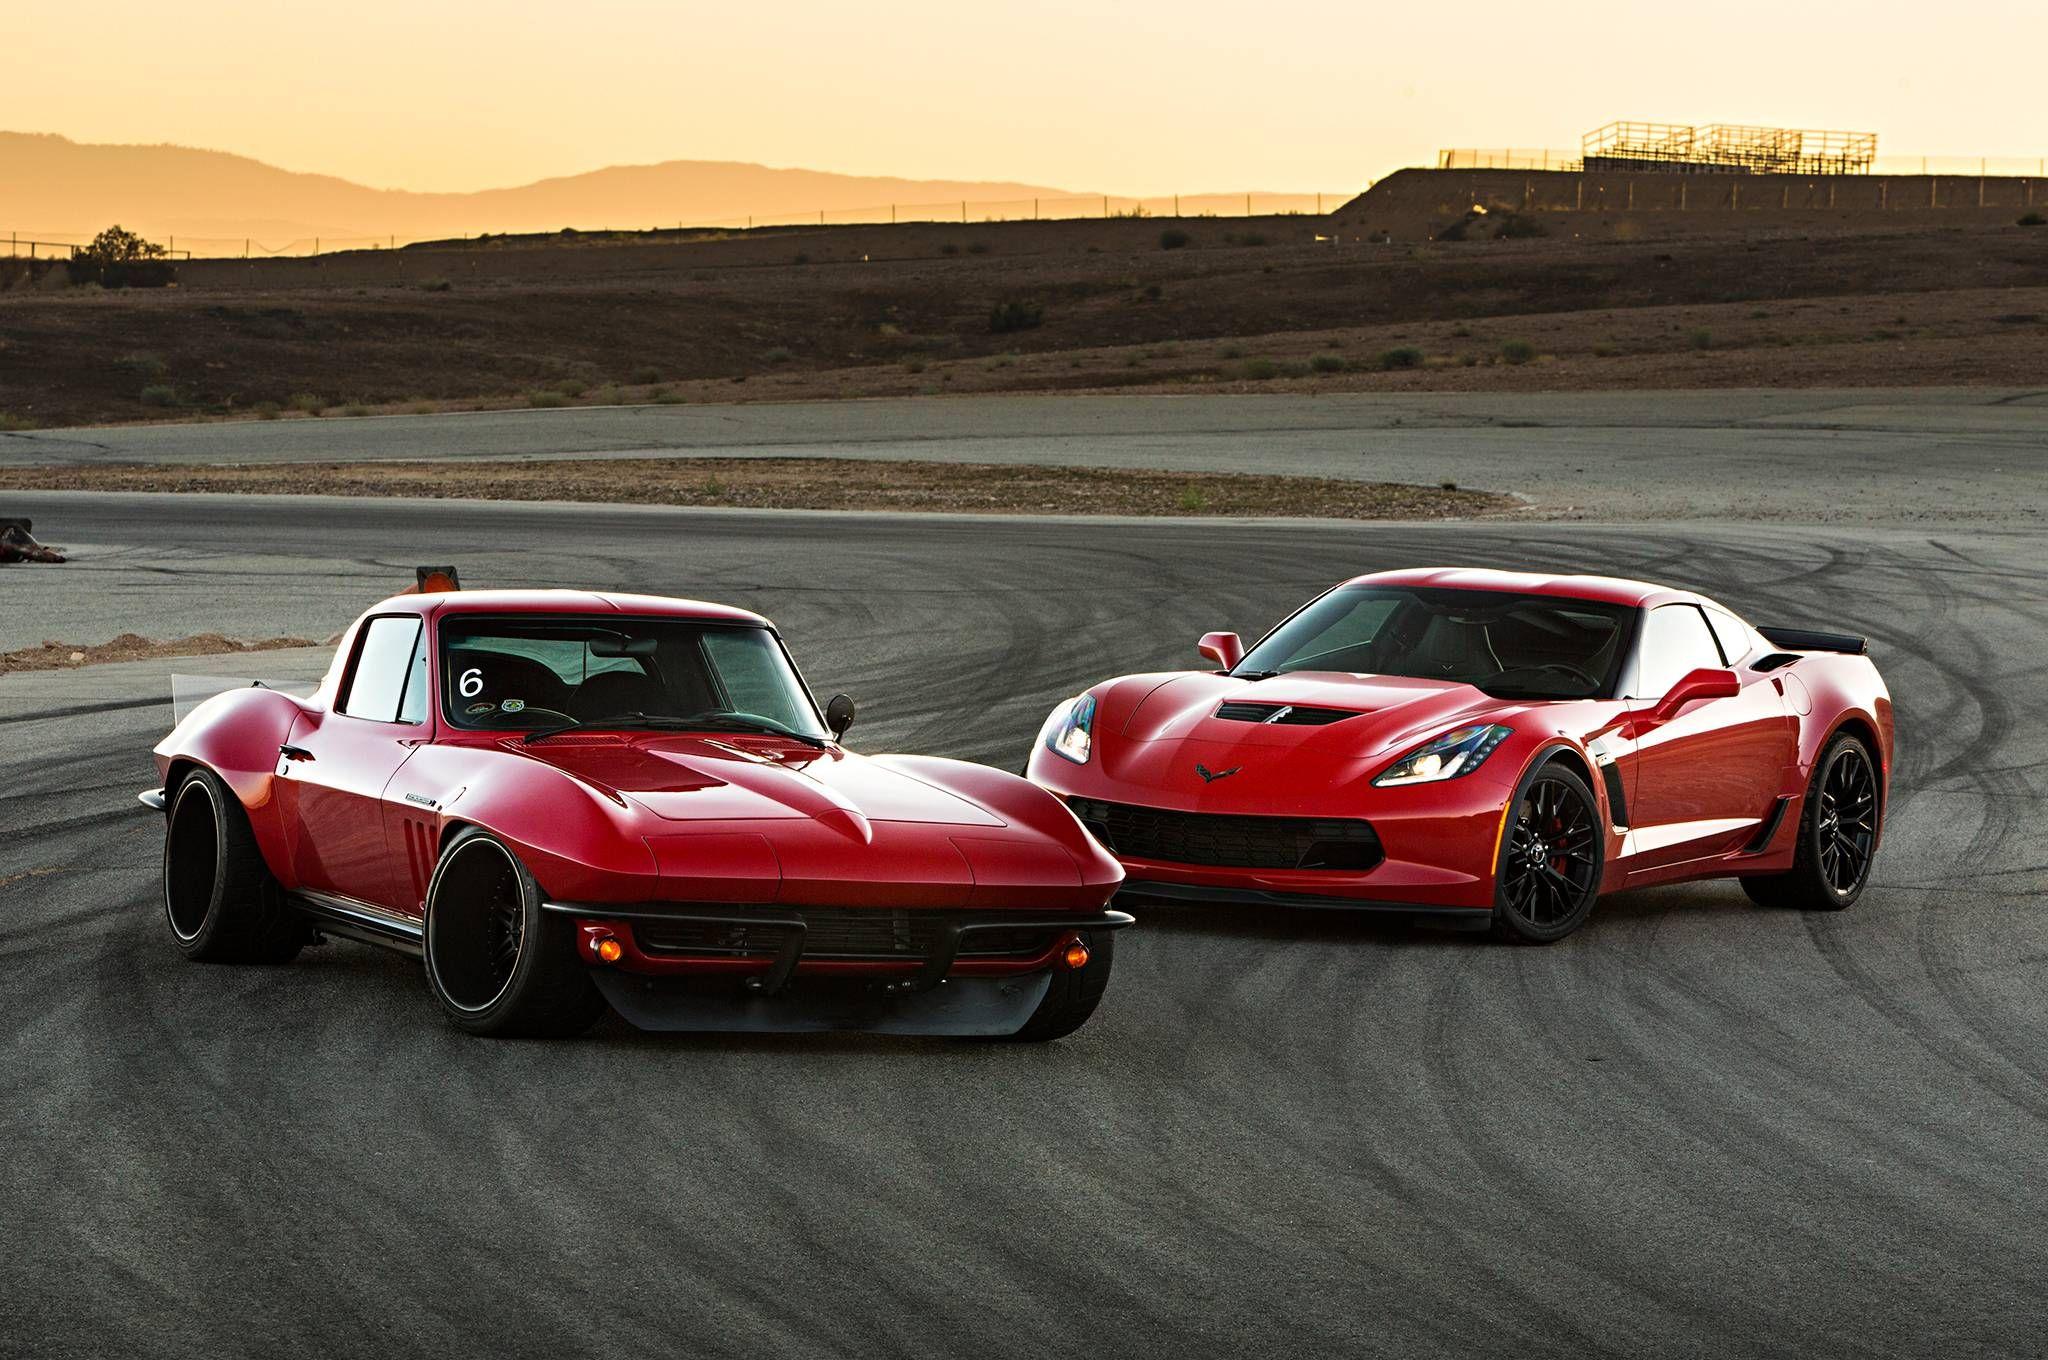 1965 Corvette and a 2015 Corvette Z06 [2048x1360] - see http://www ...